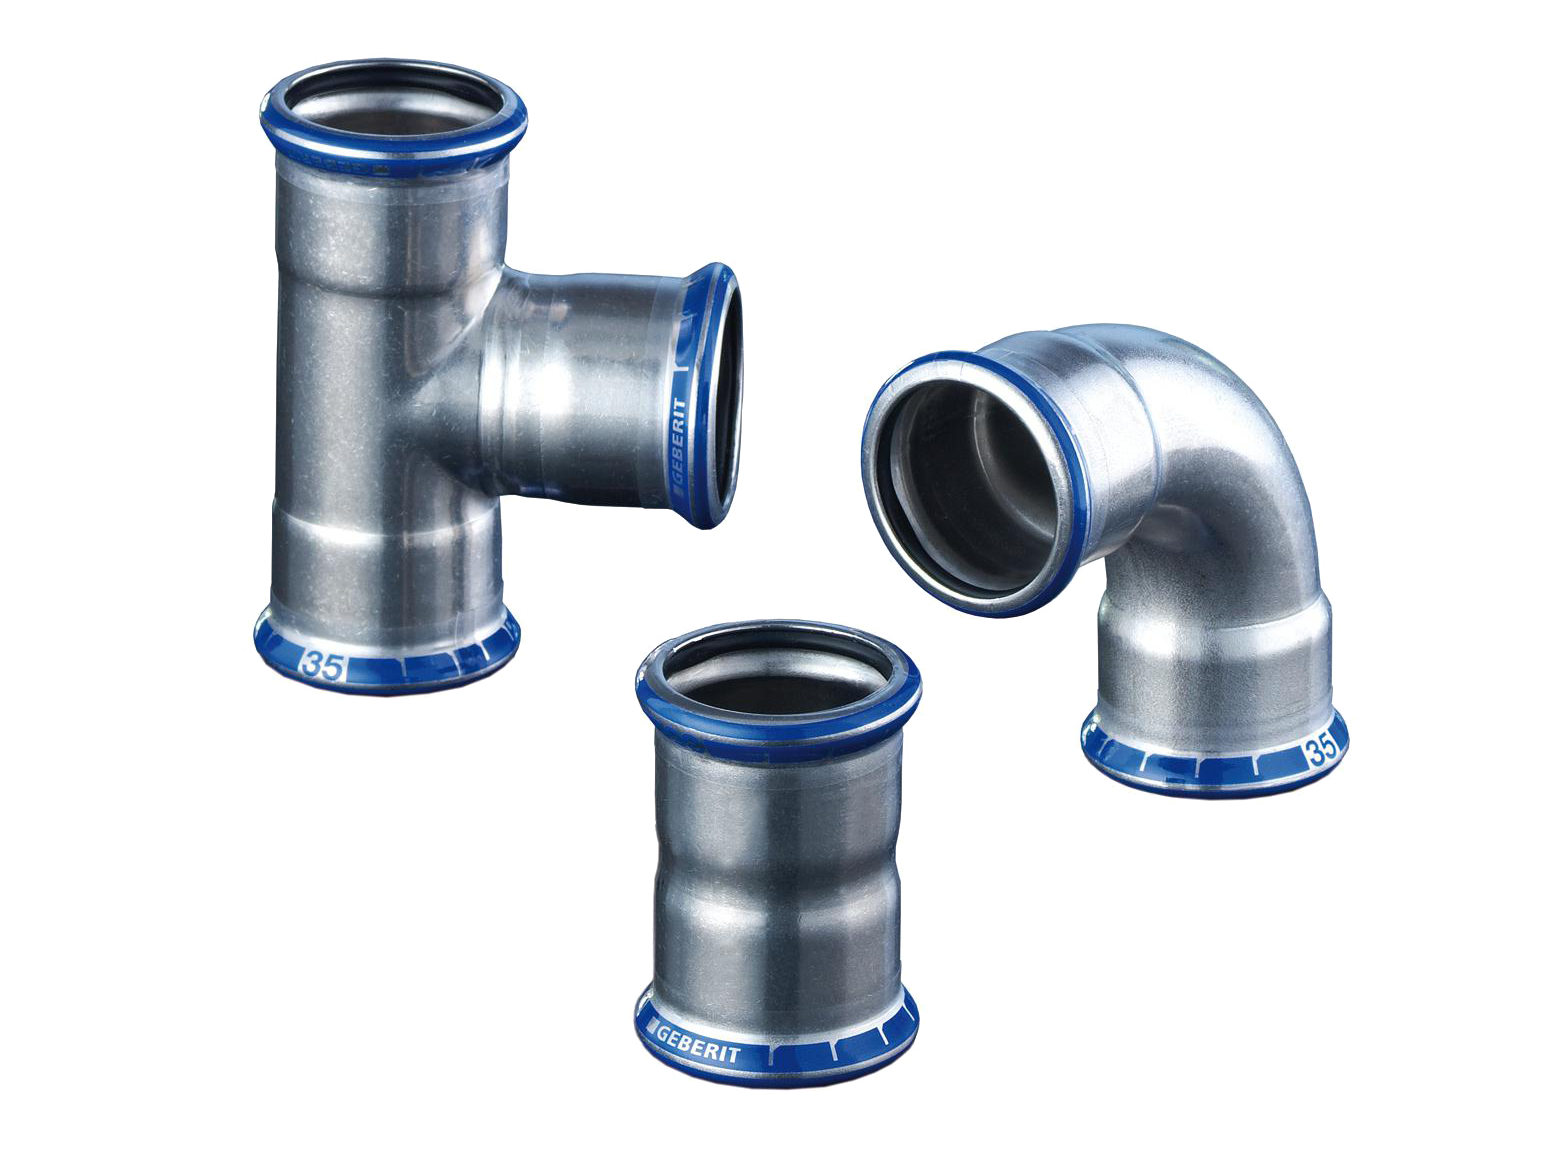 Mapress Stainless Steel Fittings